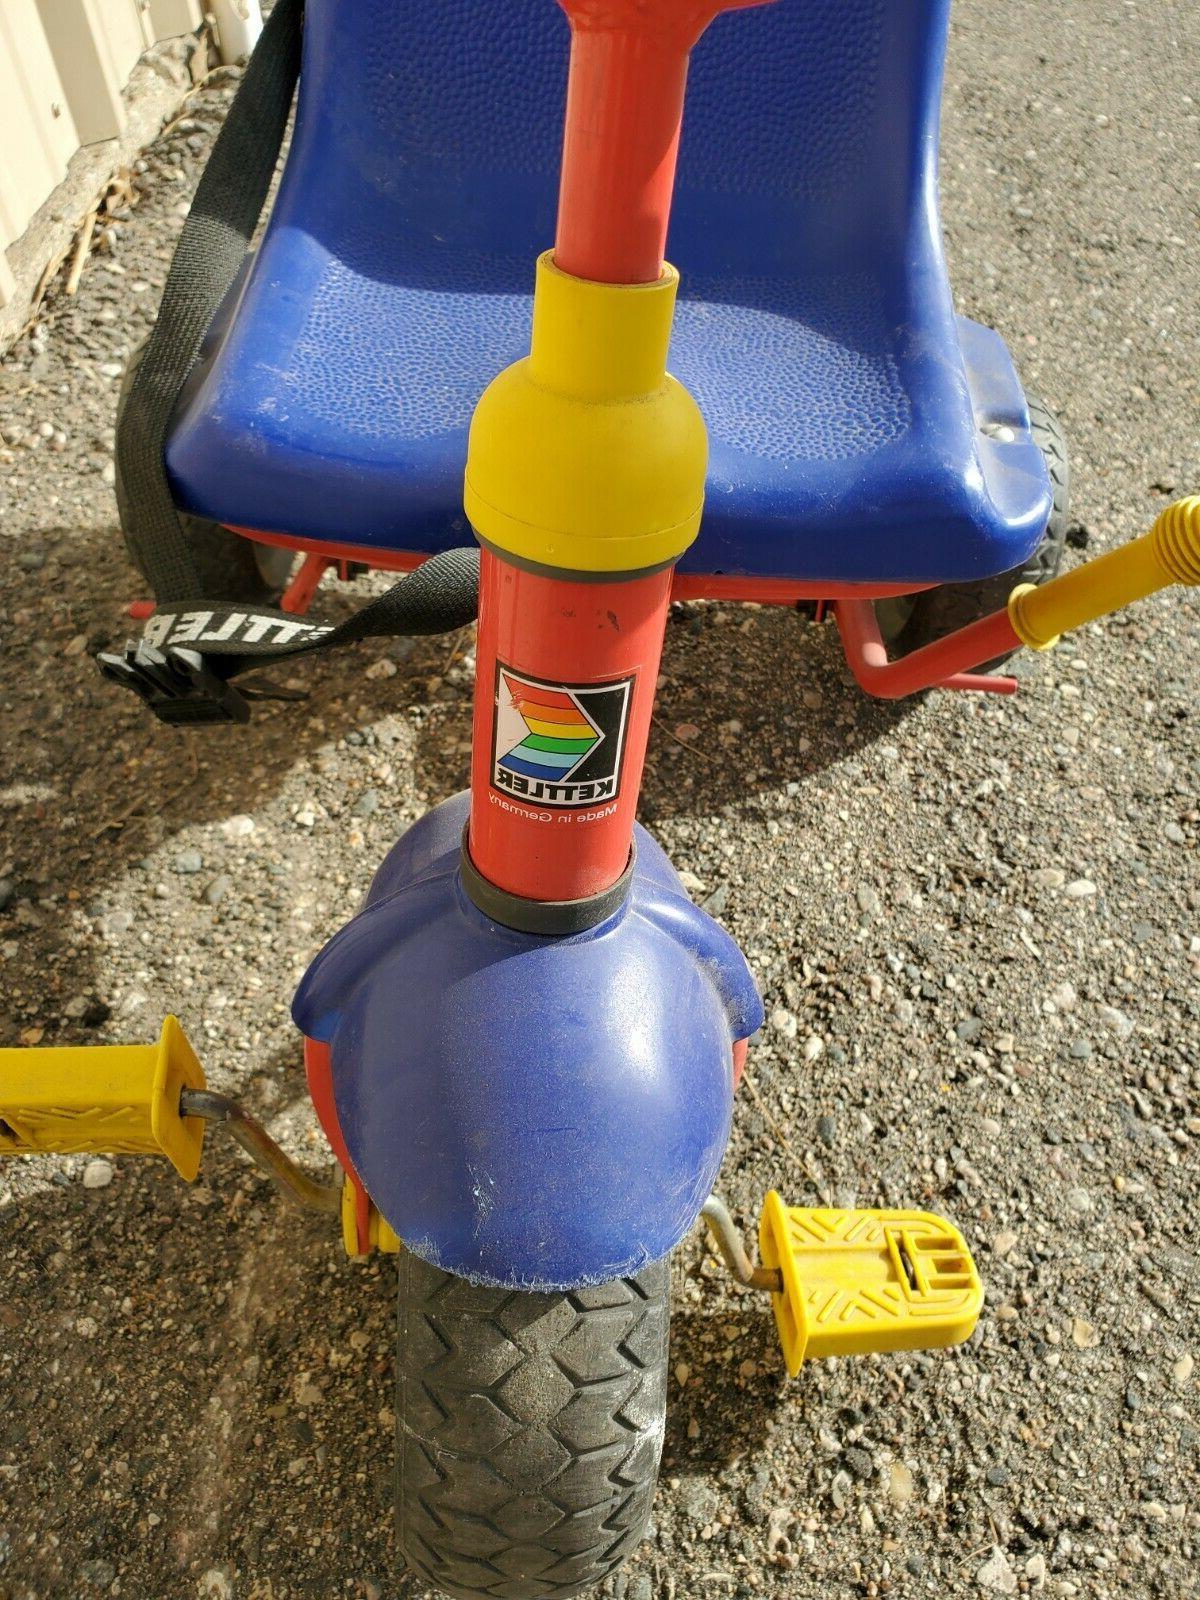 Kettler Tricycle Trike Removable Push Handle Toddler Basket